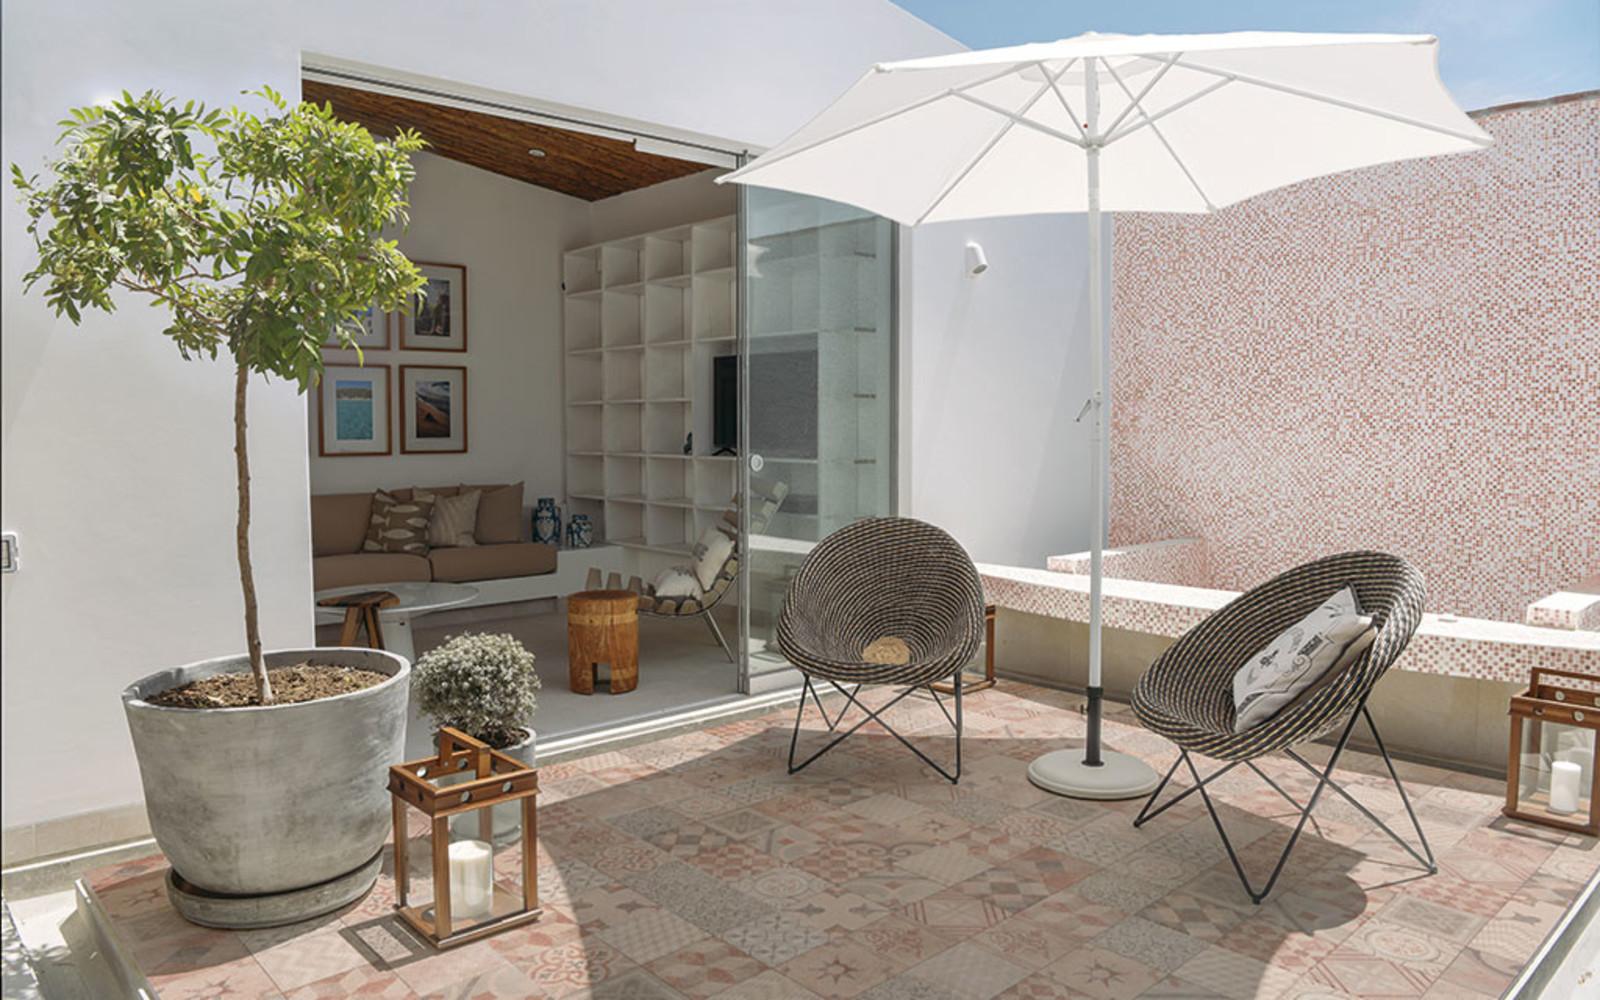 Terrassenplatte Mosaik boho Marokko